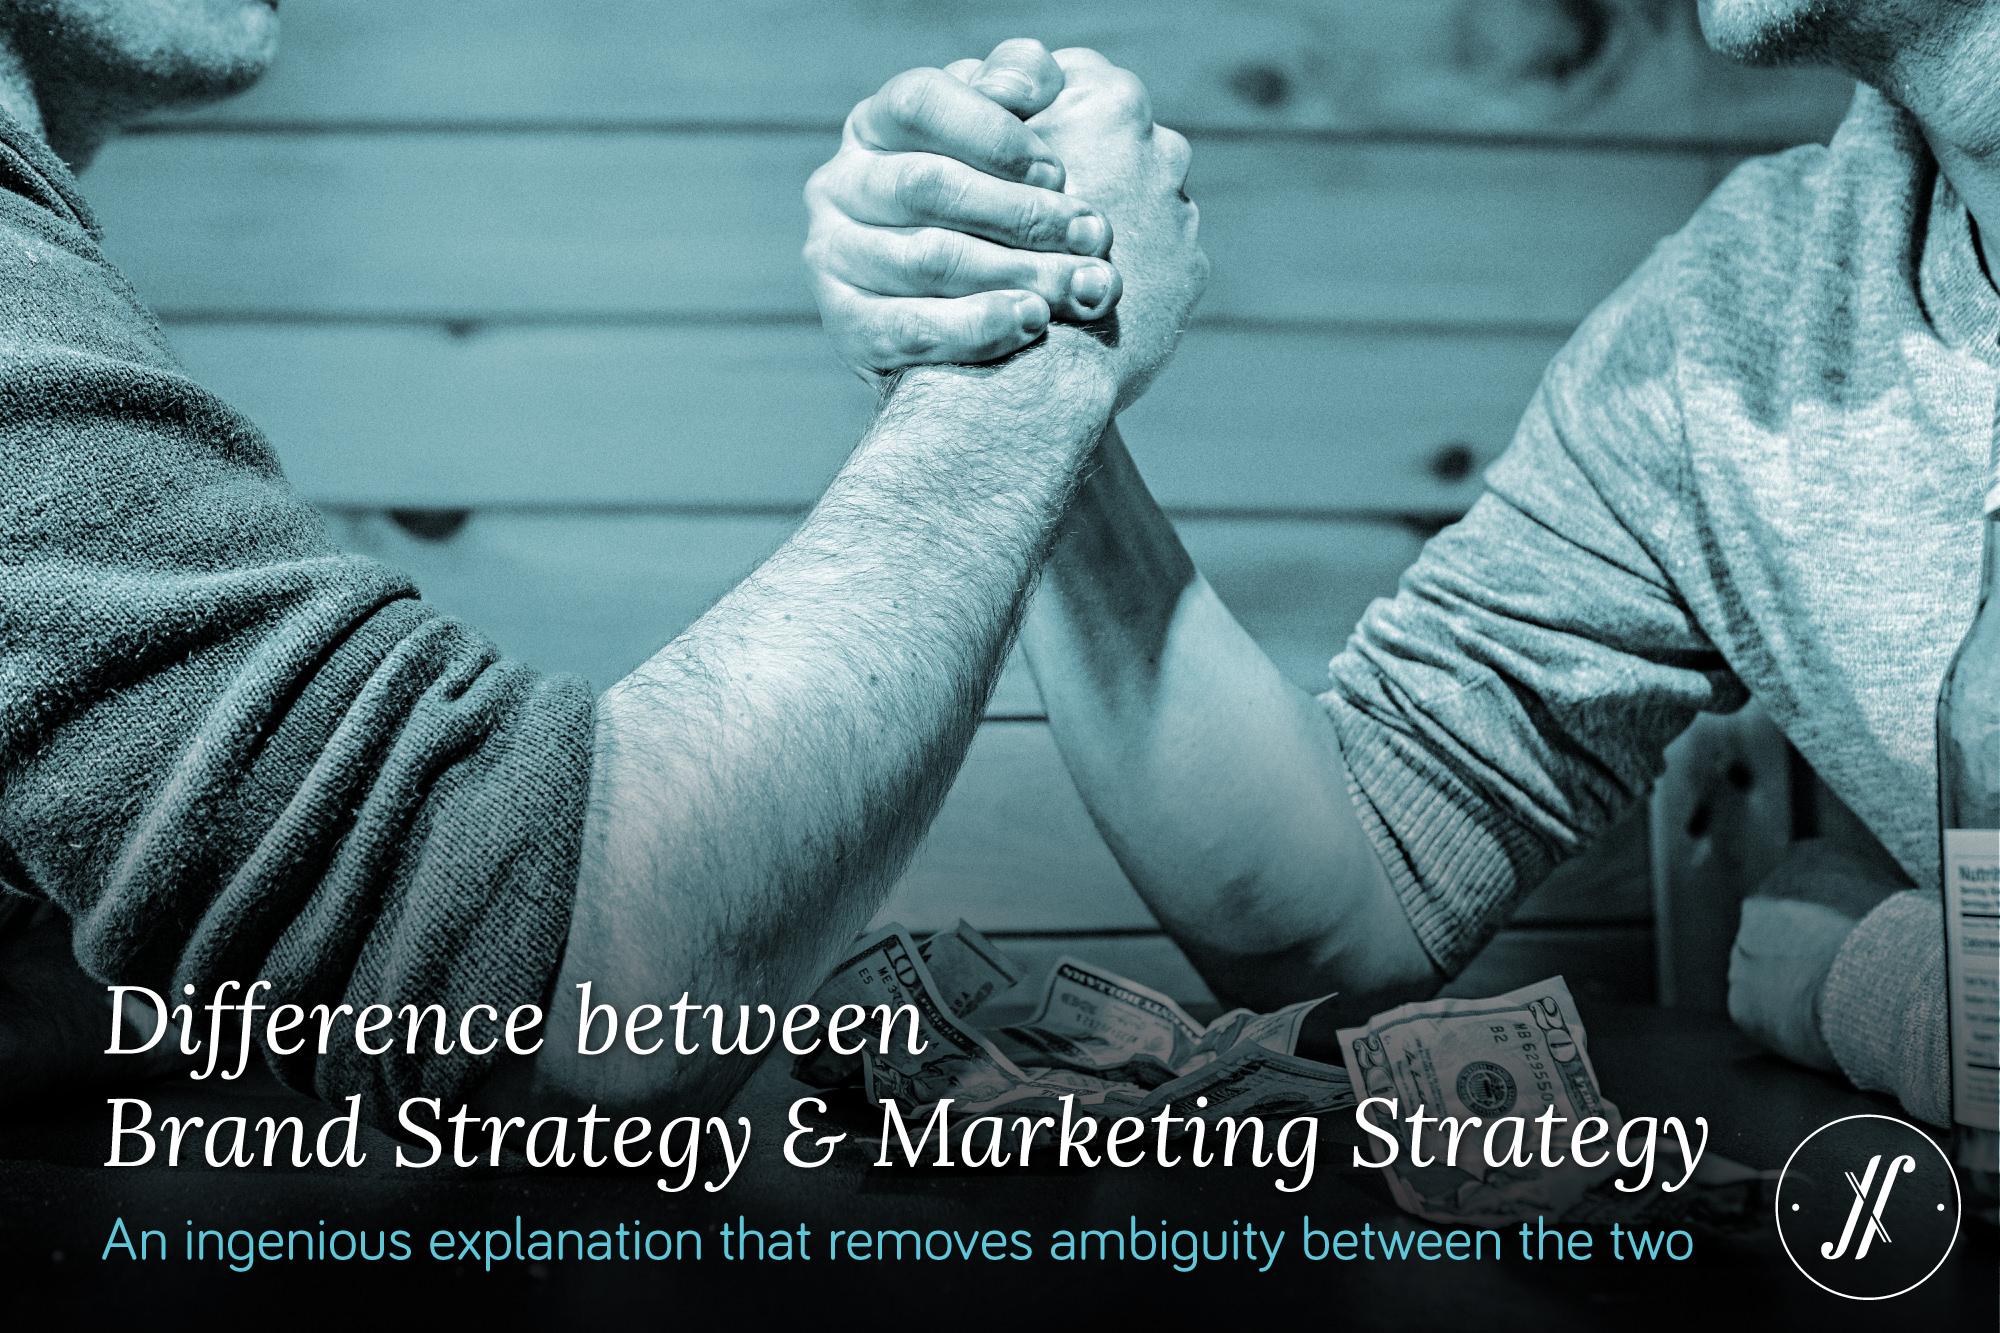 Yellow-Fishes-Branding-Strategy-and-brand-design-agency-Mumbai-Brand-Strategy-vs-Marketing-Strategy.jpg